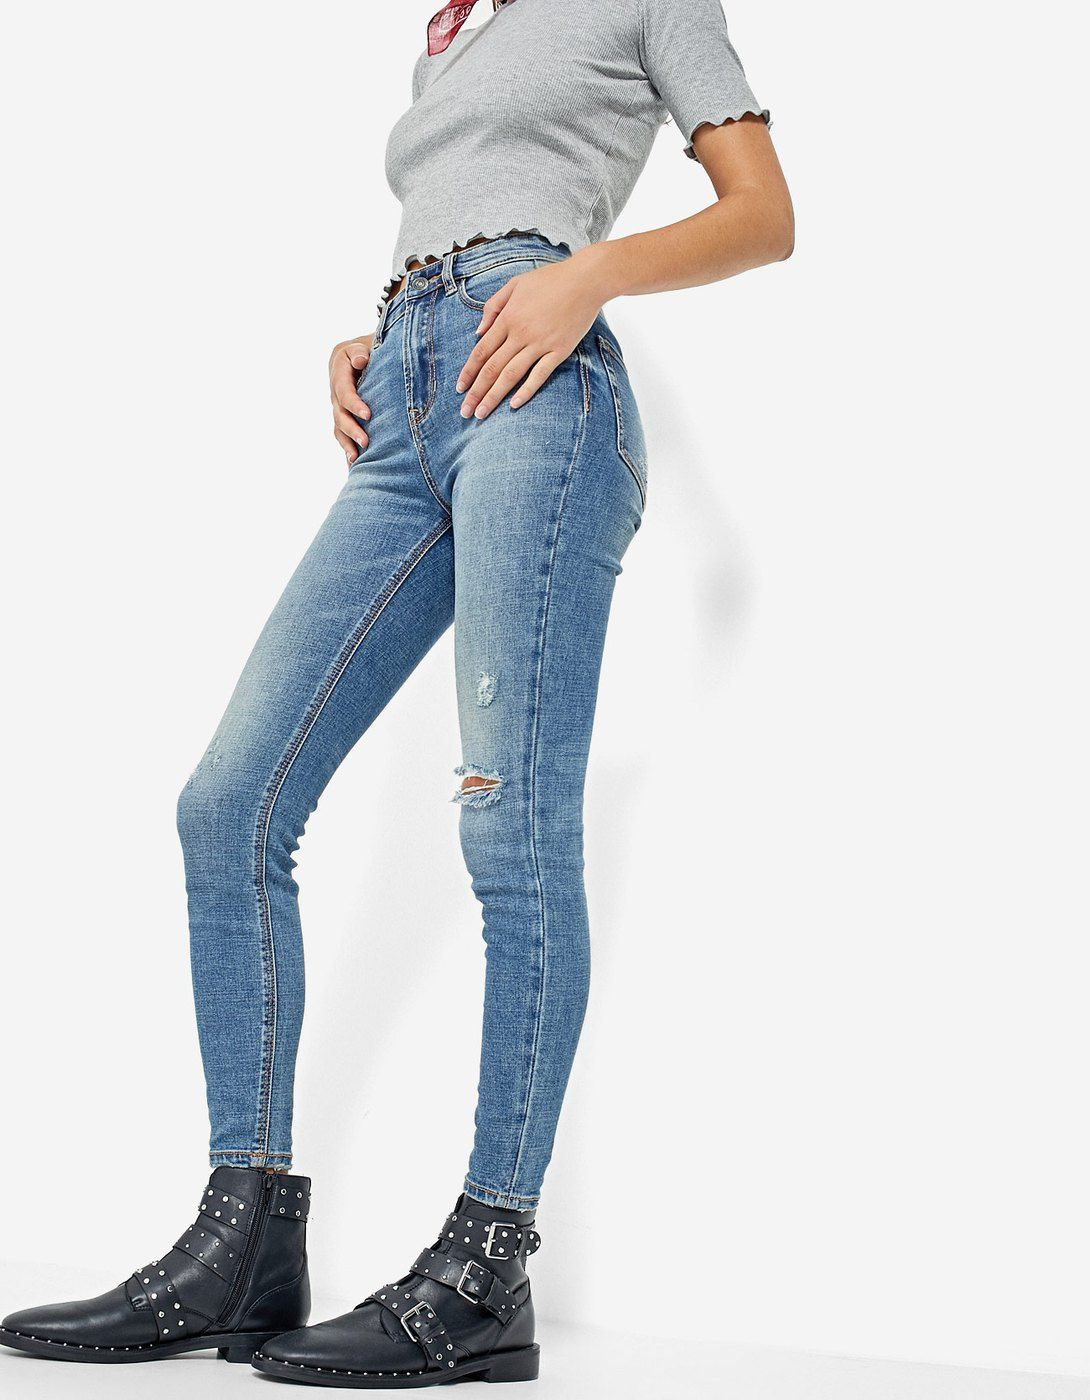 Denim Super High Waist Jeans Stradivarius Espana Ropa Jeans Denim